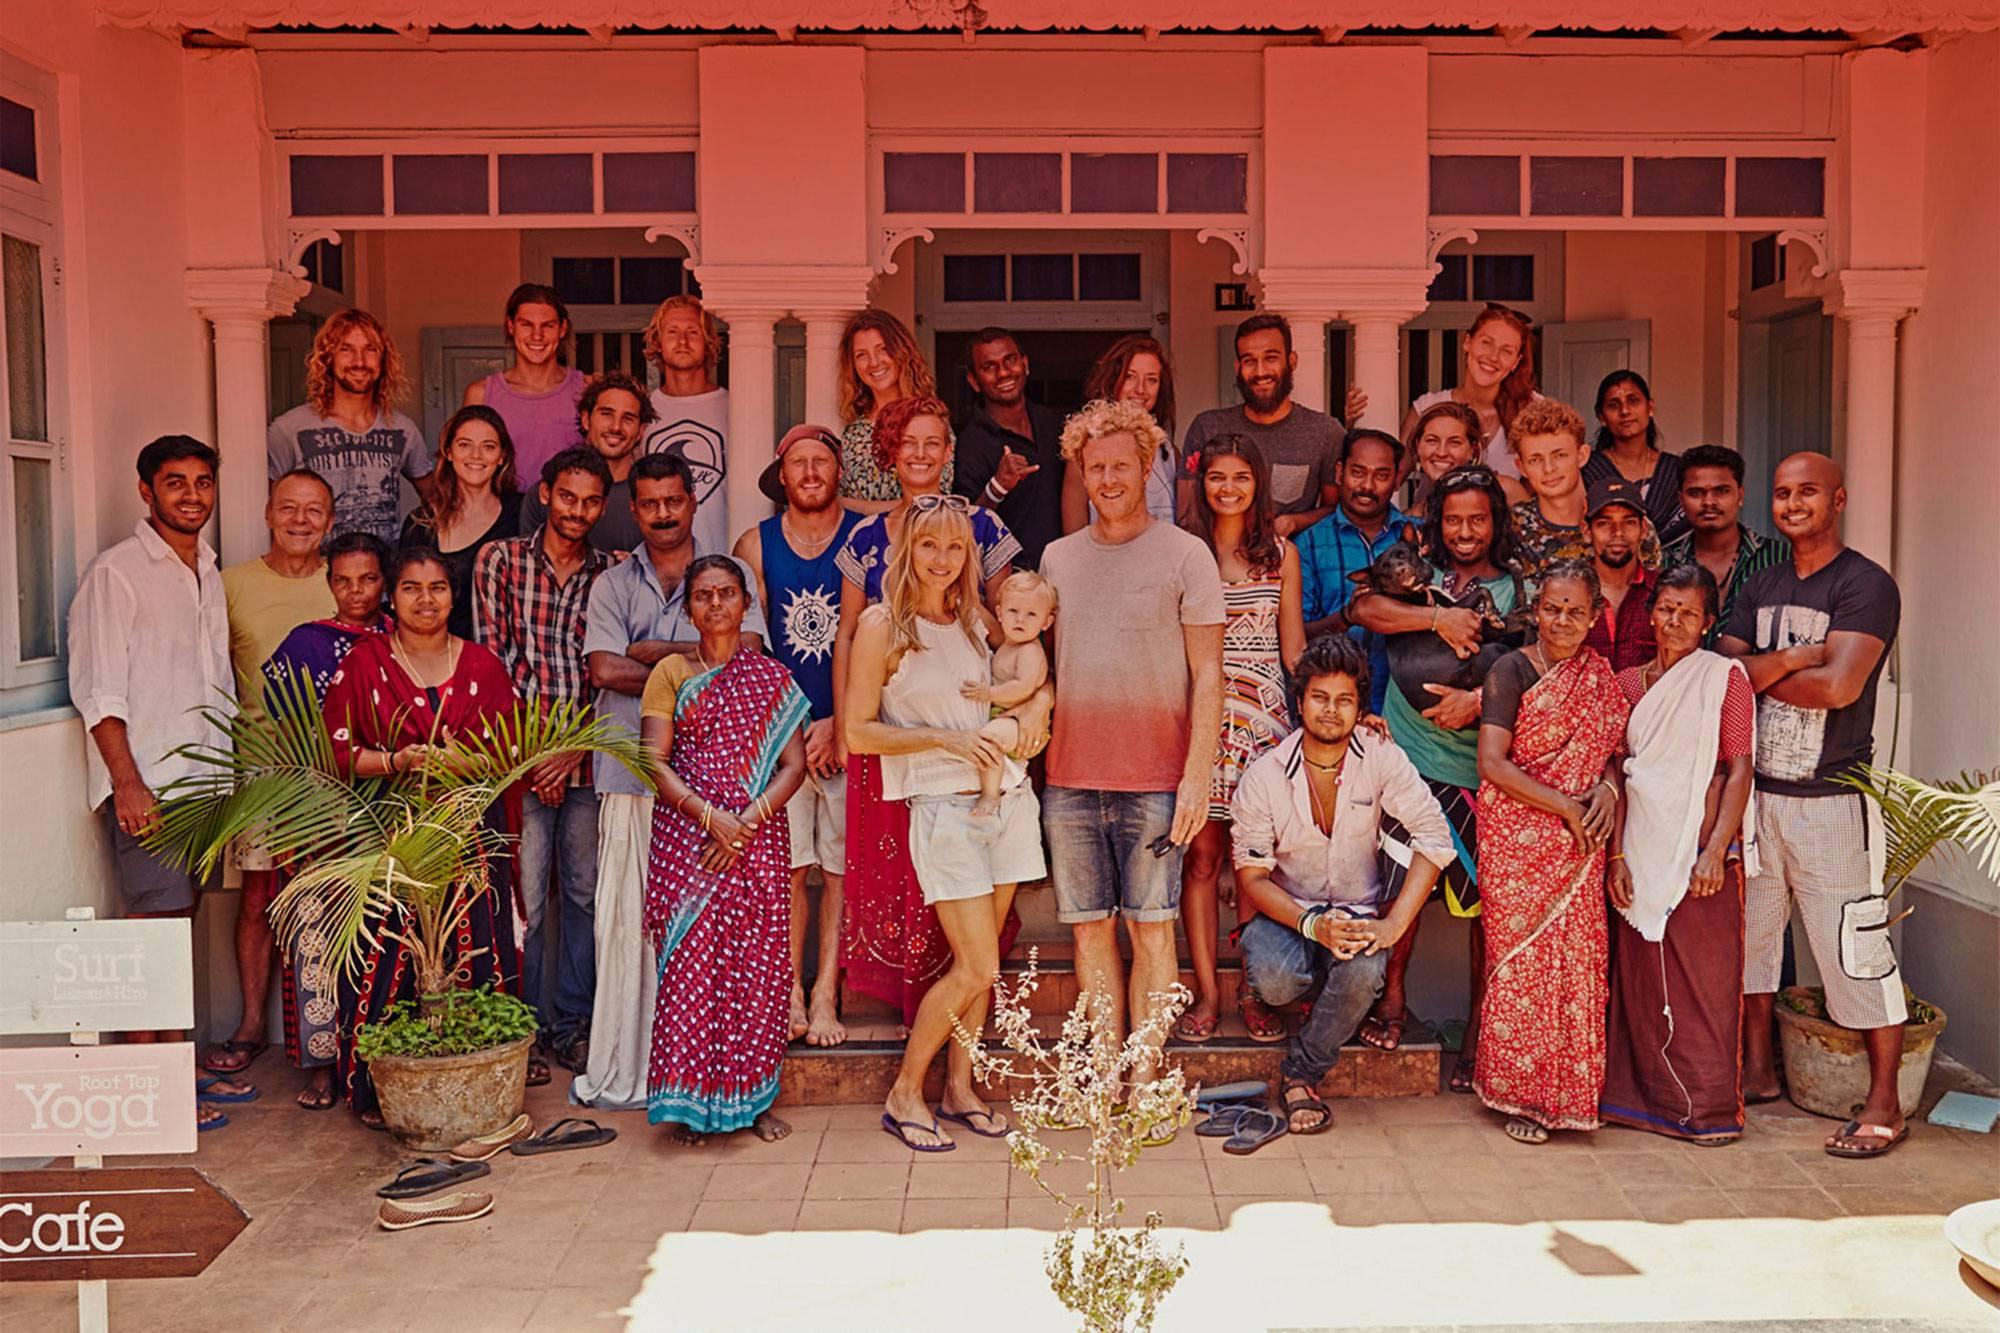 https://www.soulandsurf.com/wp-content/uploads/2021/09/Retreatsindia-images-India-Team.jpg